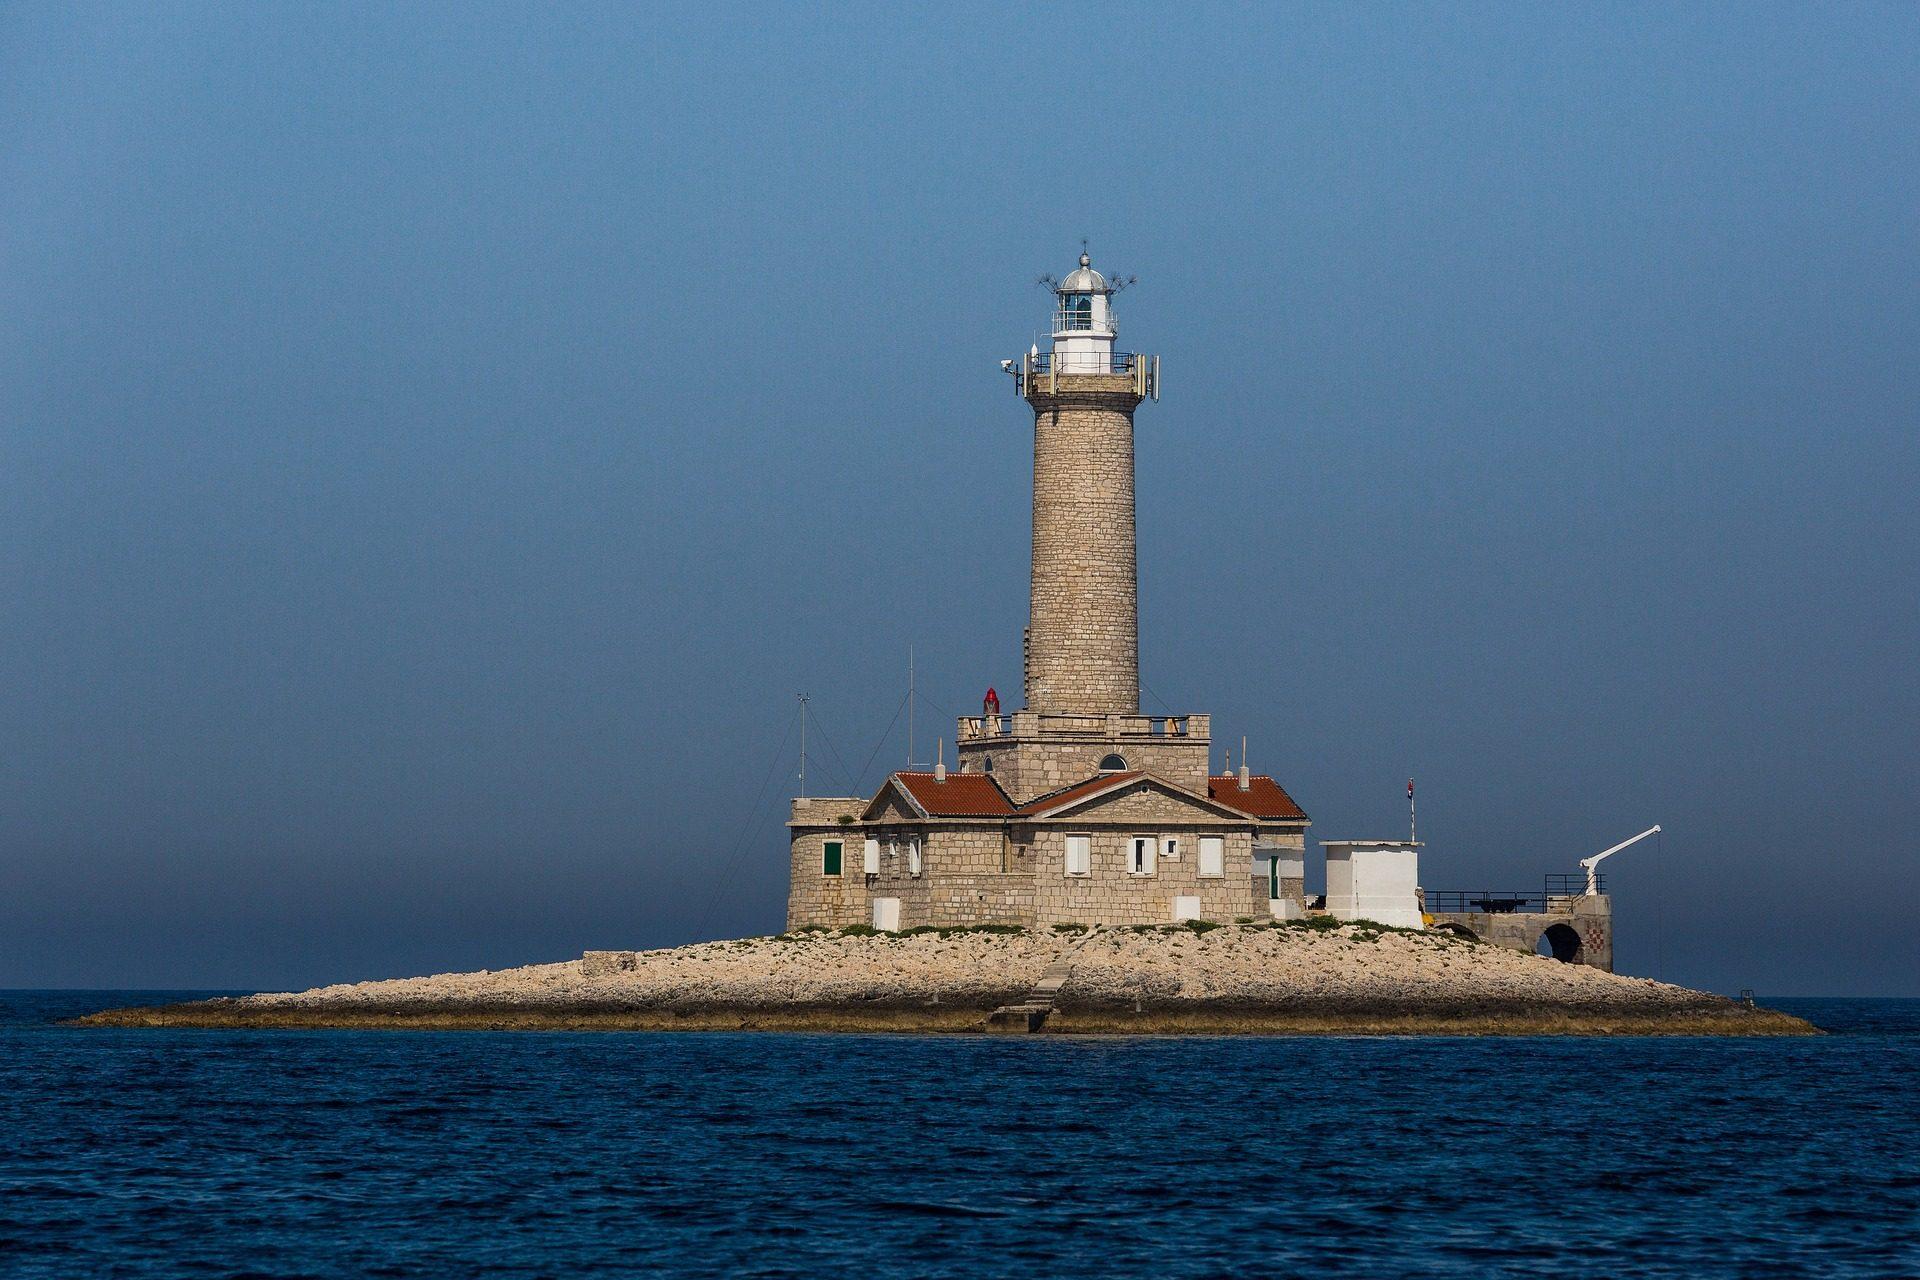 faro, isla, mar, islote, torre - Fondos de Pantalla HD - professor-falken.com